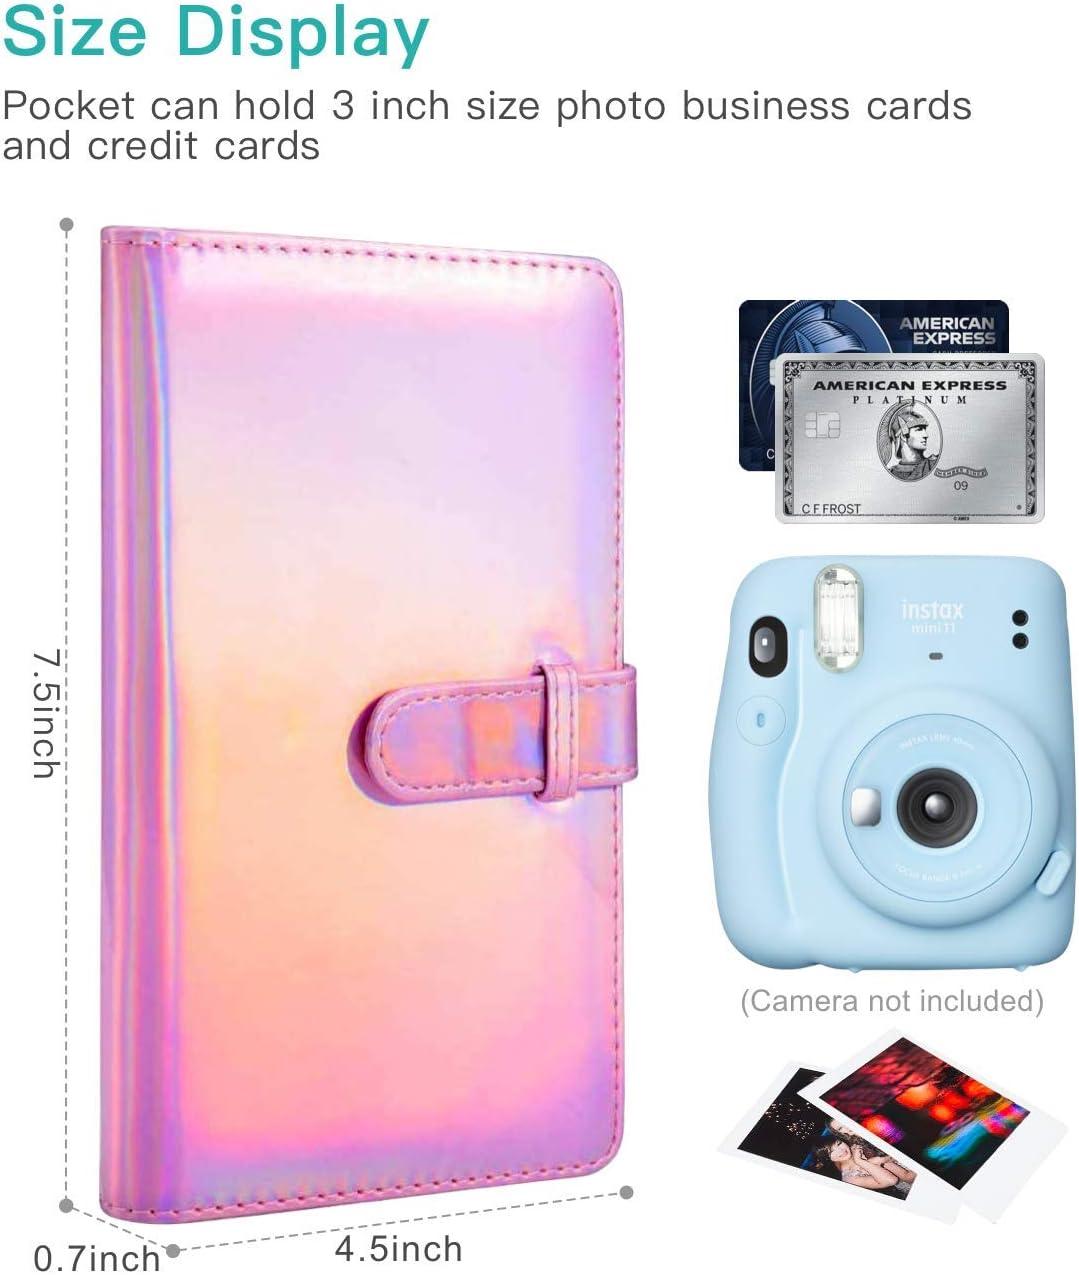 Mini Photo Album Portable Wallet Photo Album Pink Goodsnetic 96 Pockets Mini Album Compatible with Fujifilm Instax Mini 7s 8 8+ 9 25 26 50s 70 90 Film Polaroid PIC-300 Z2300 Film Instant Camera